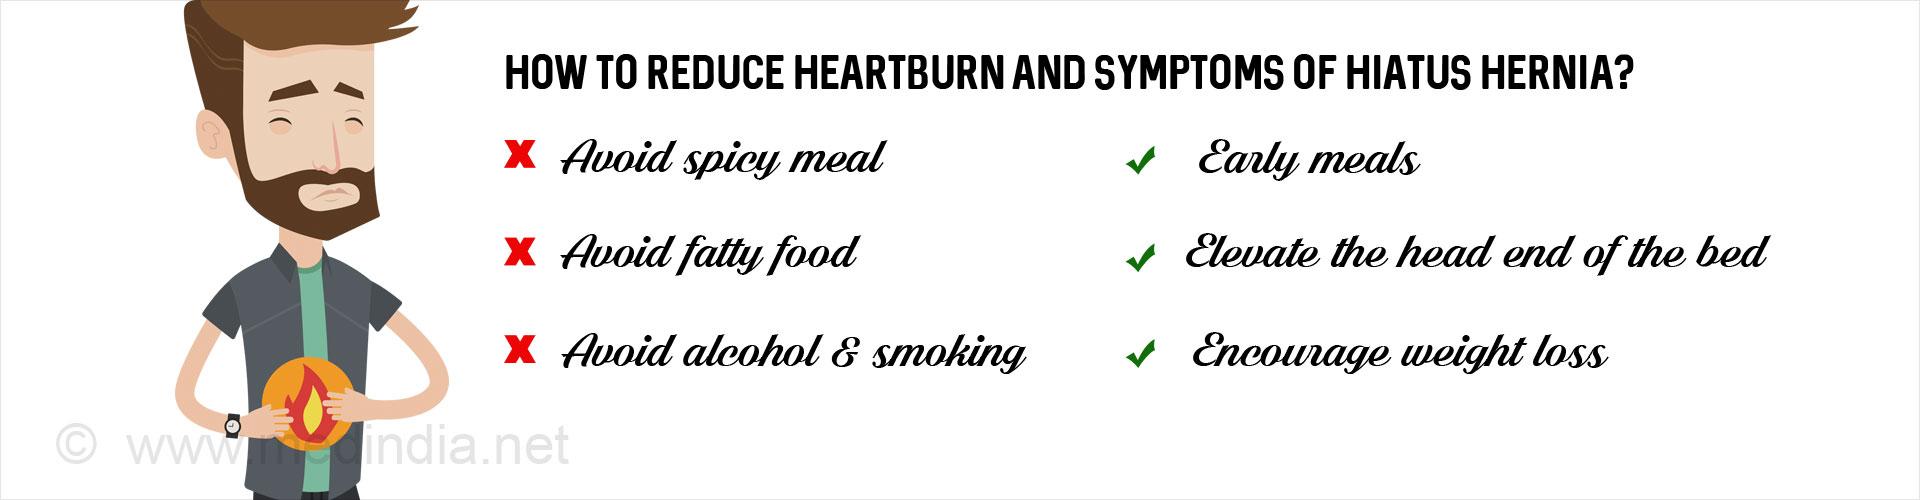 Hiatus Hernia - Types, Causes, Symptoms, Complications